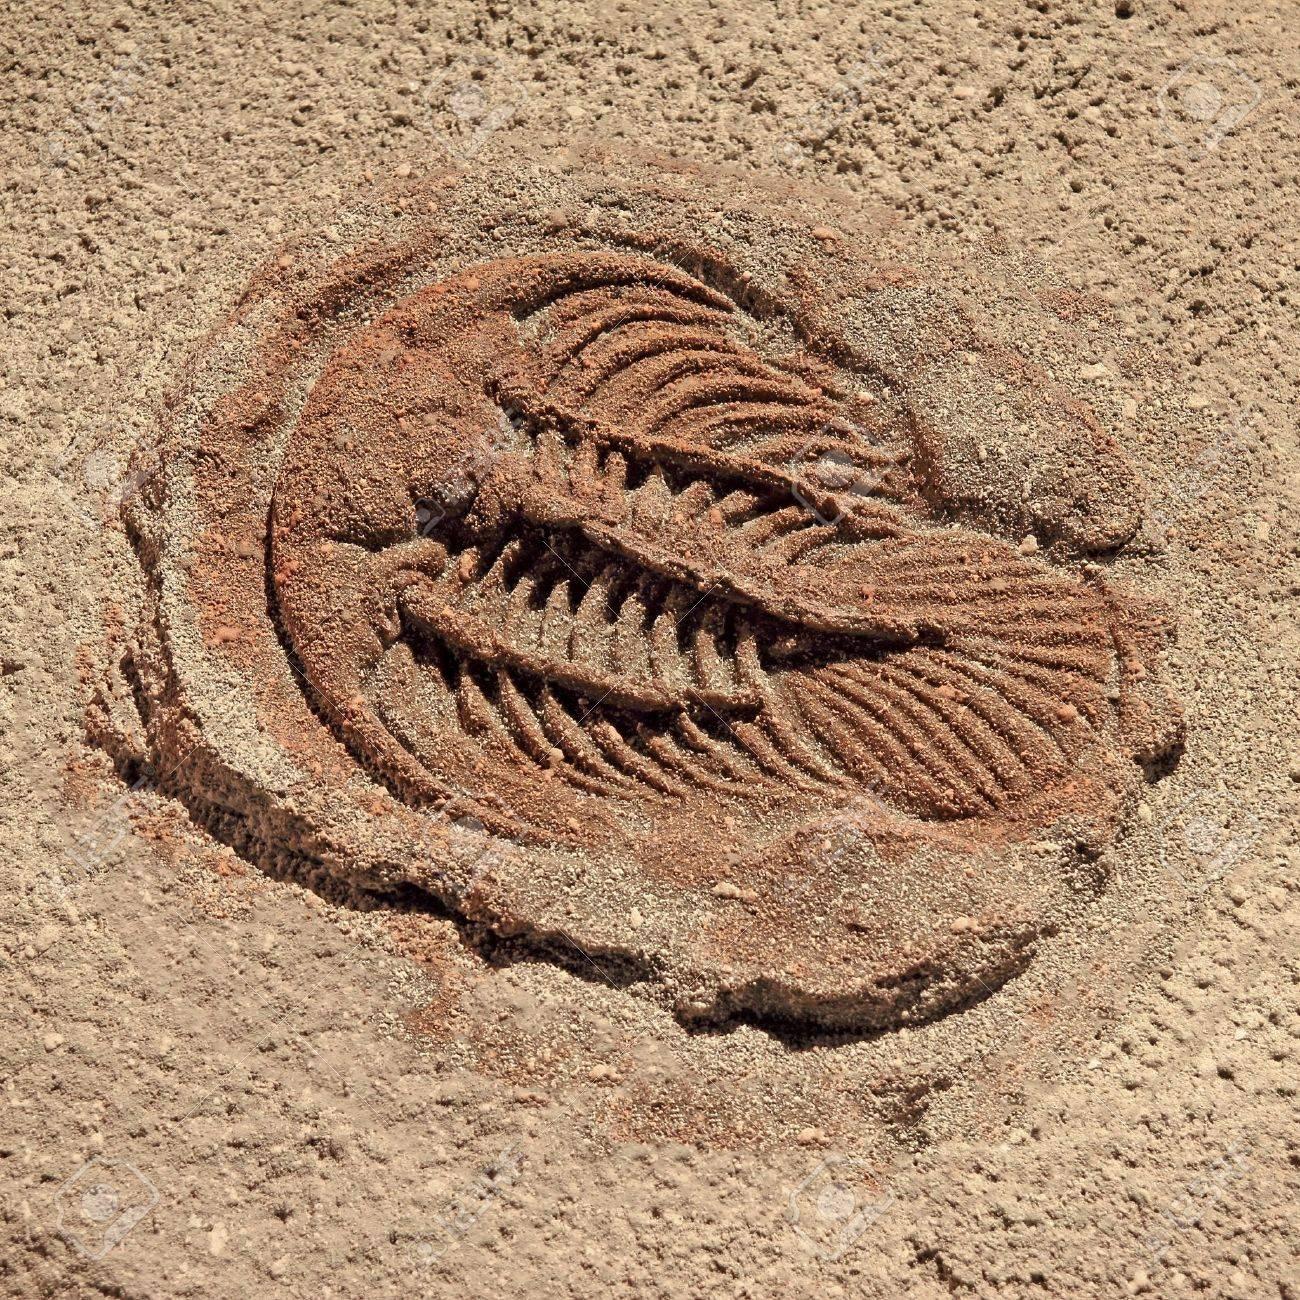 trilobite beetle turtle fossil Stock Photo - 12233227